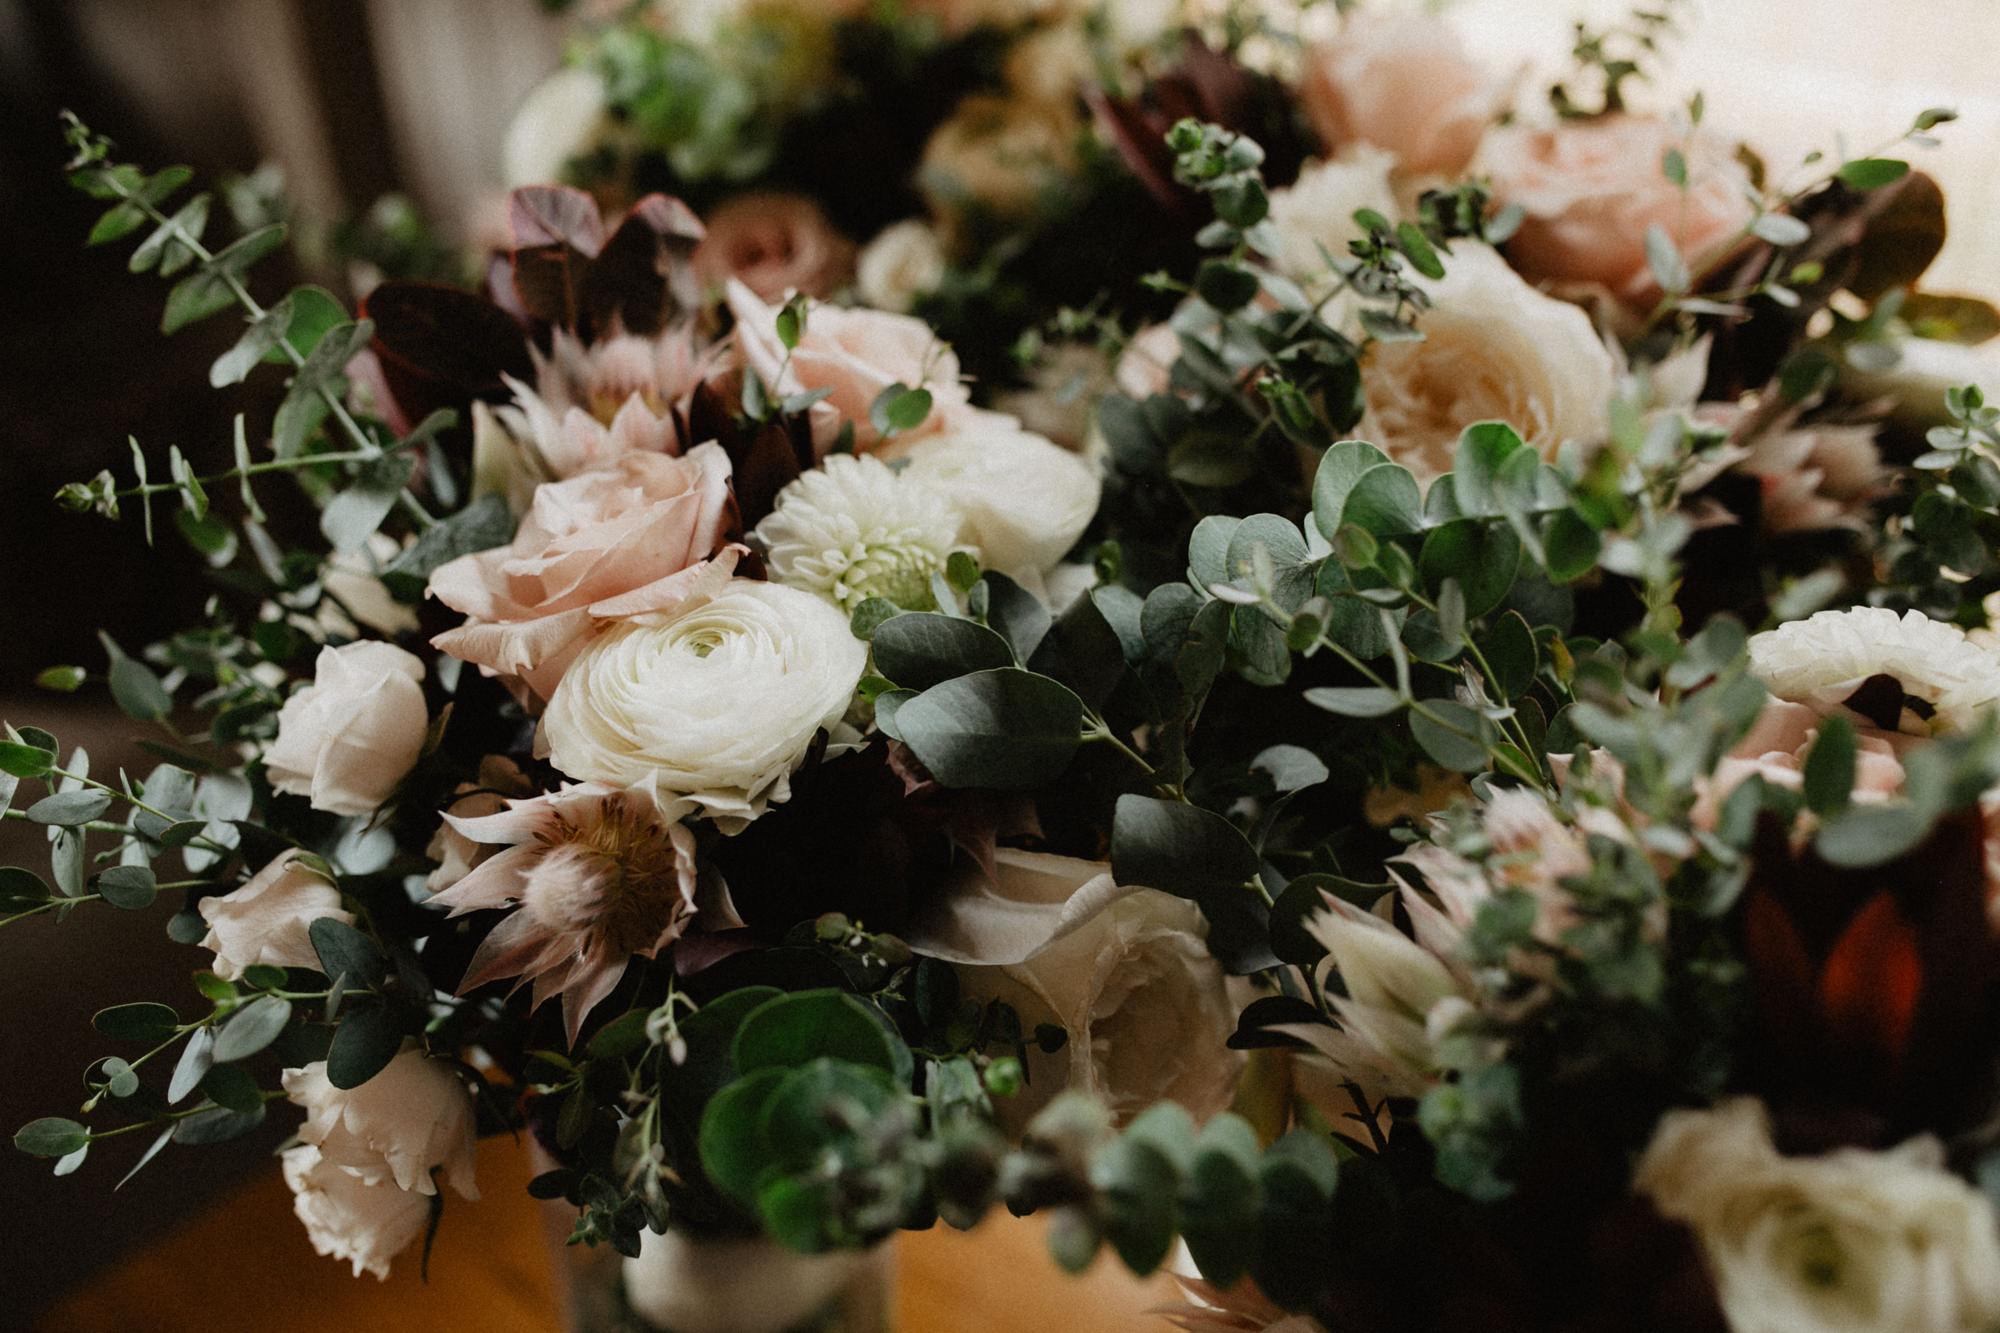 terrain-events-wedding-photographer-23.jpg